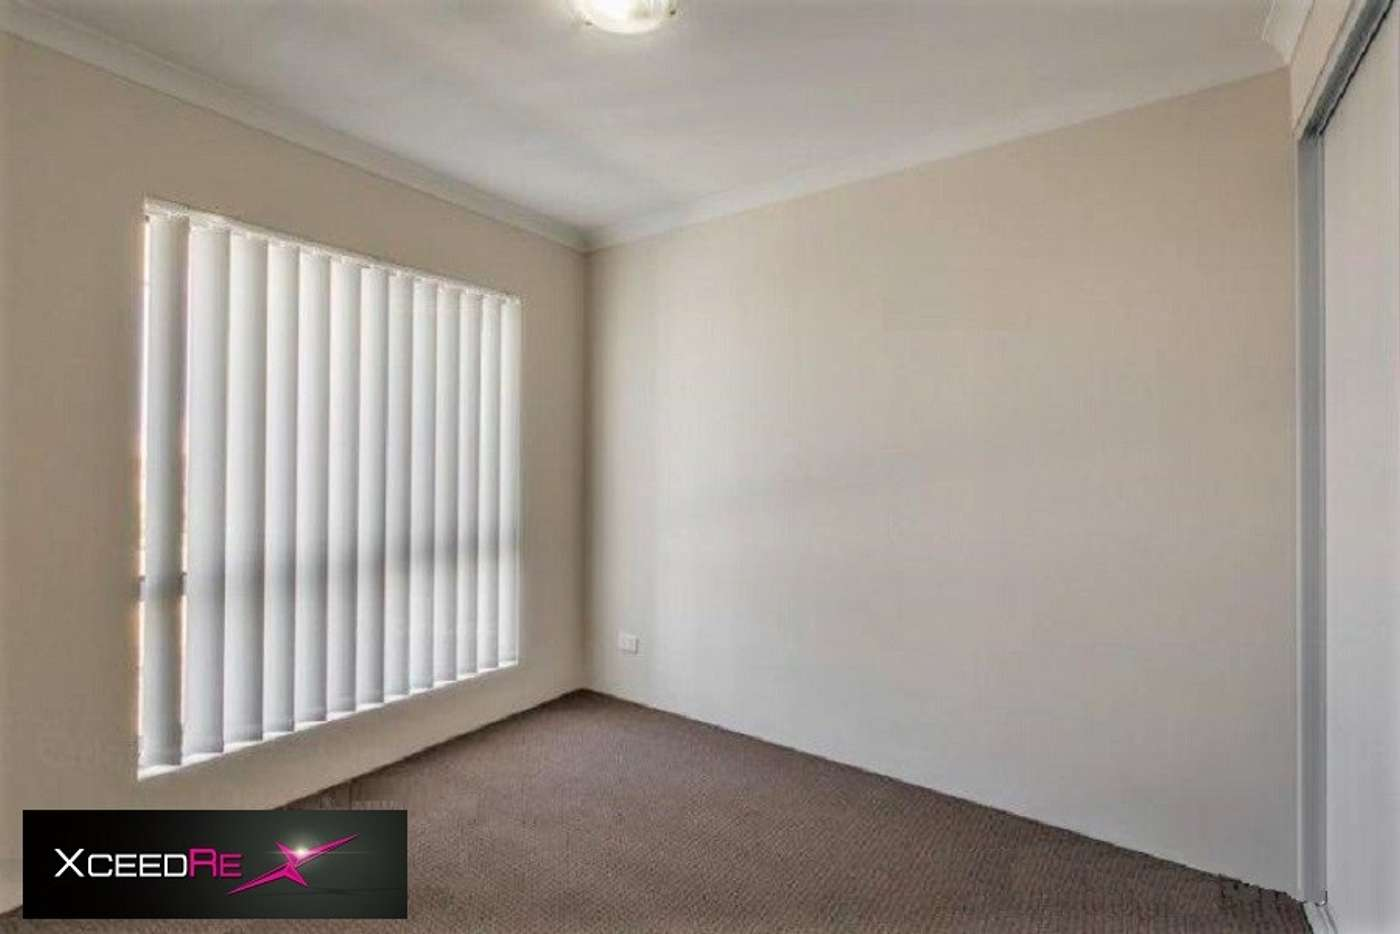 Sixth view of Homely house listing, 10 Midas Way, Alkimos WA 6038